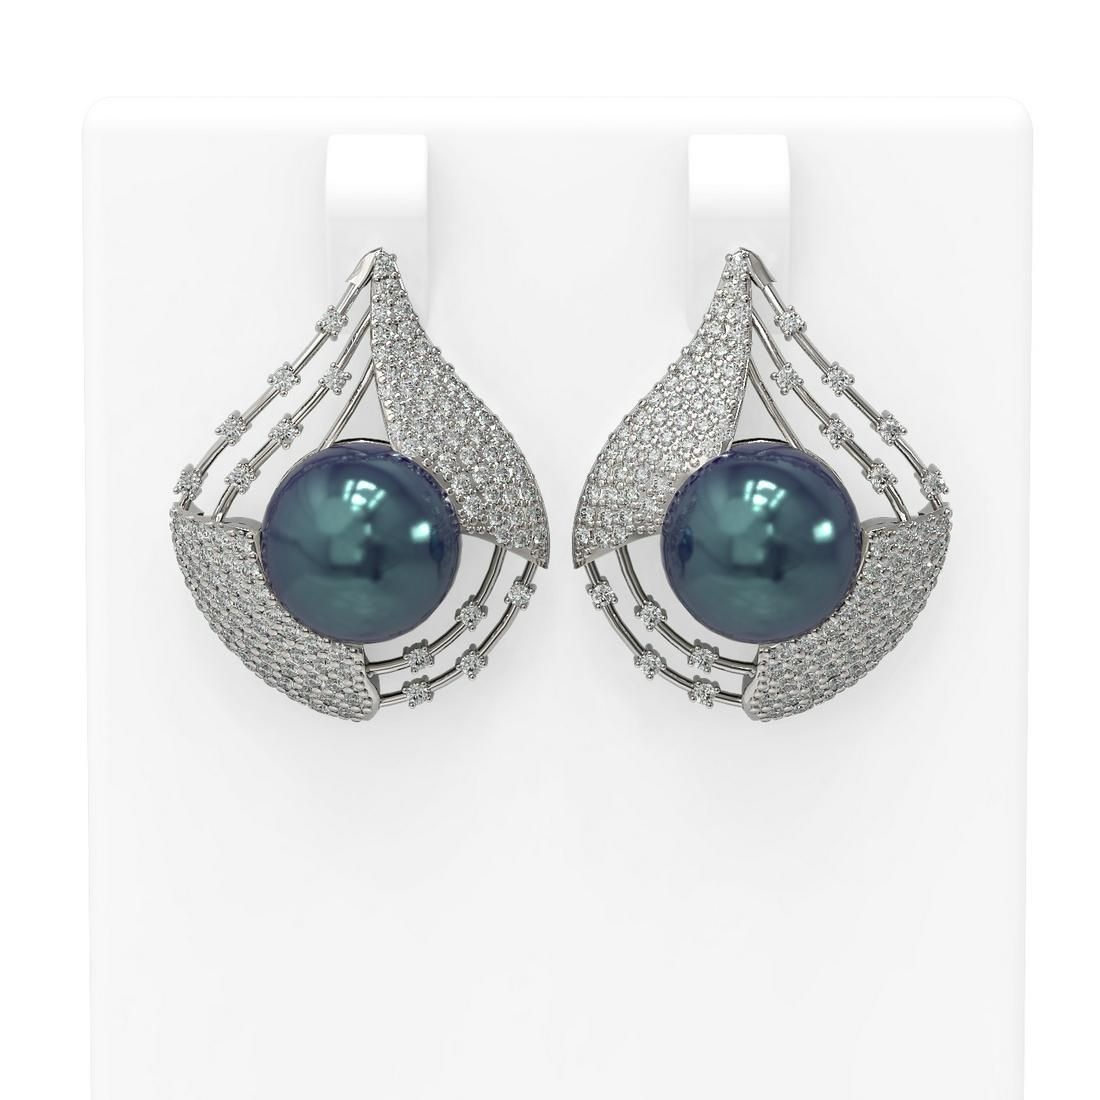 2.3 ctw Diamond & Pearl Earrings 18K White Gold -